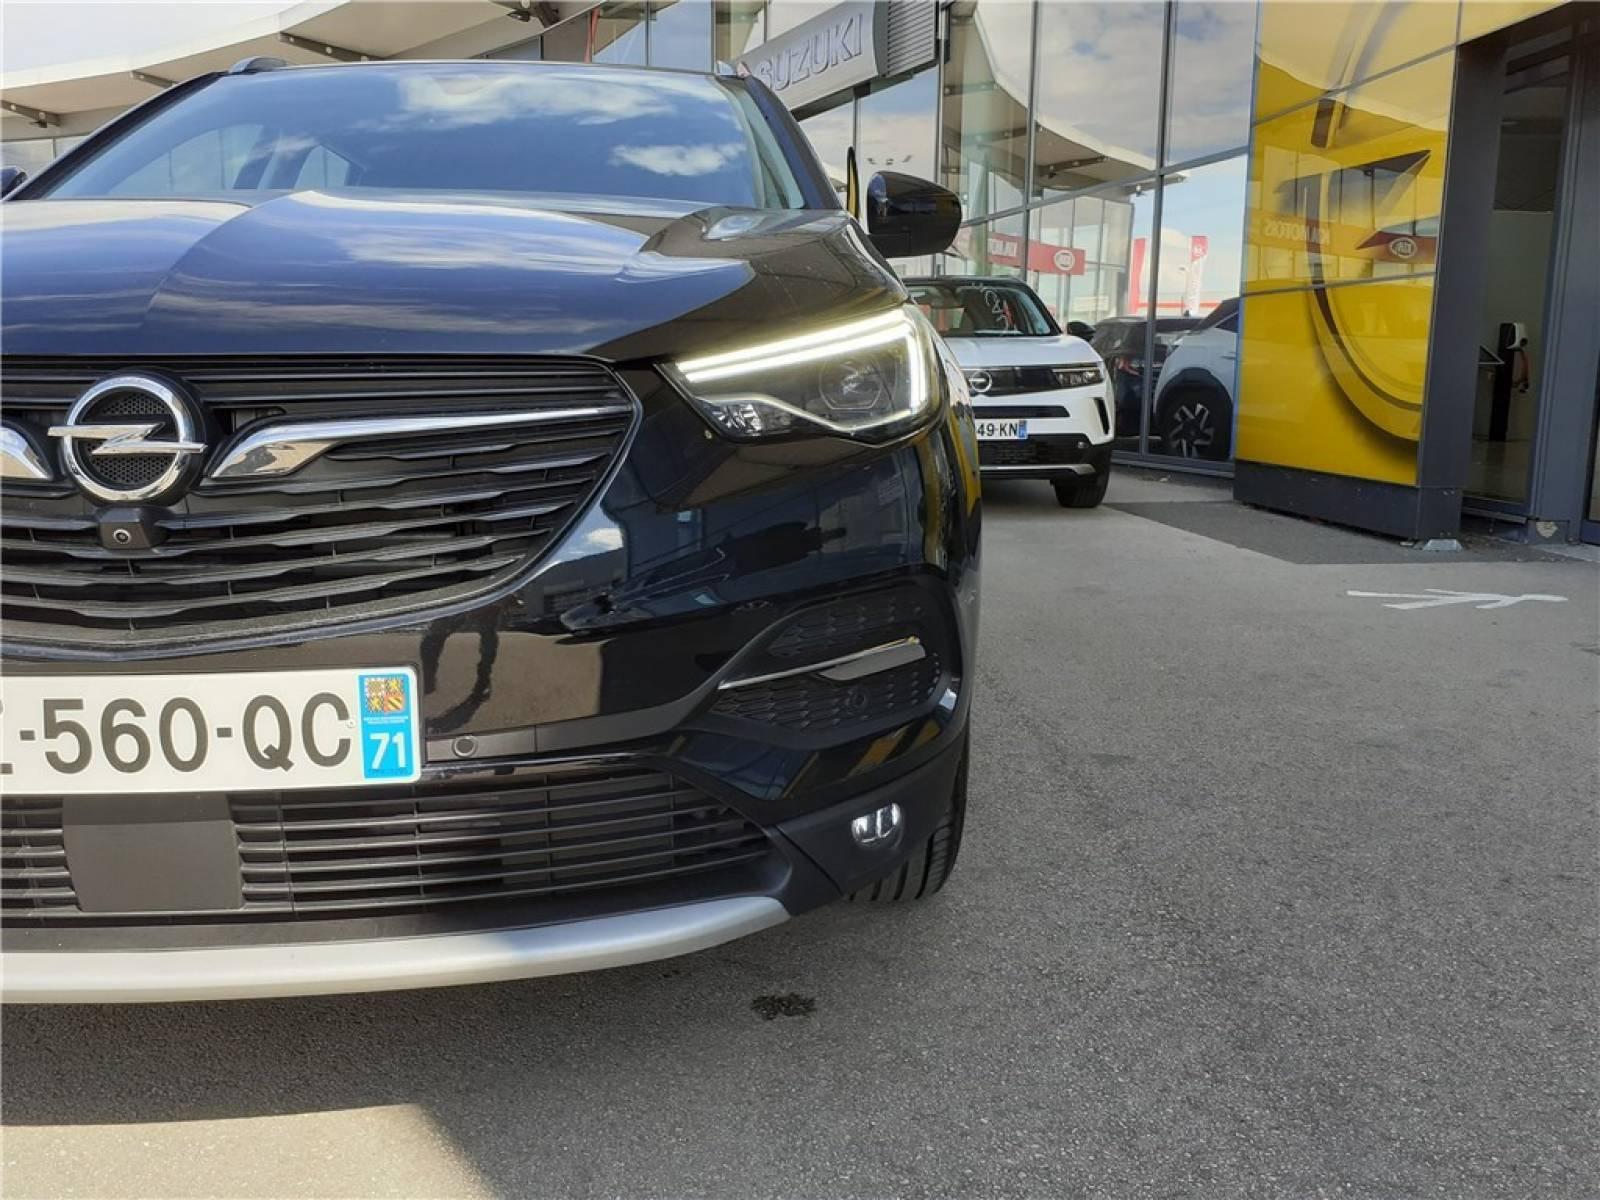 OPEL Grandland X 1.5 Diesel 130 ch BVA8 - véhicule d'occasion - Groupe Guillet - Opel Magicauto - Chalon-sur-Saône - 71380 - Saint-Marcel - 3